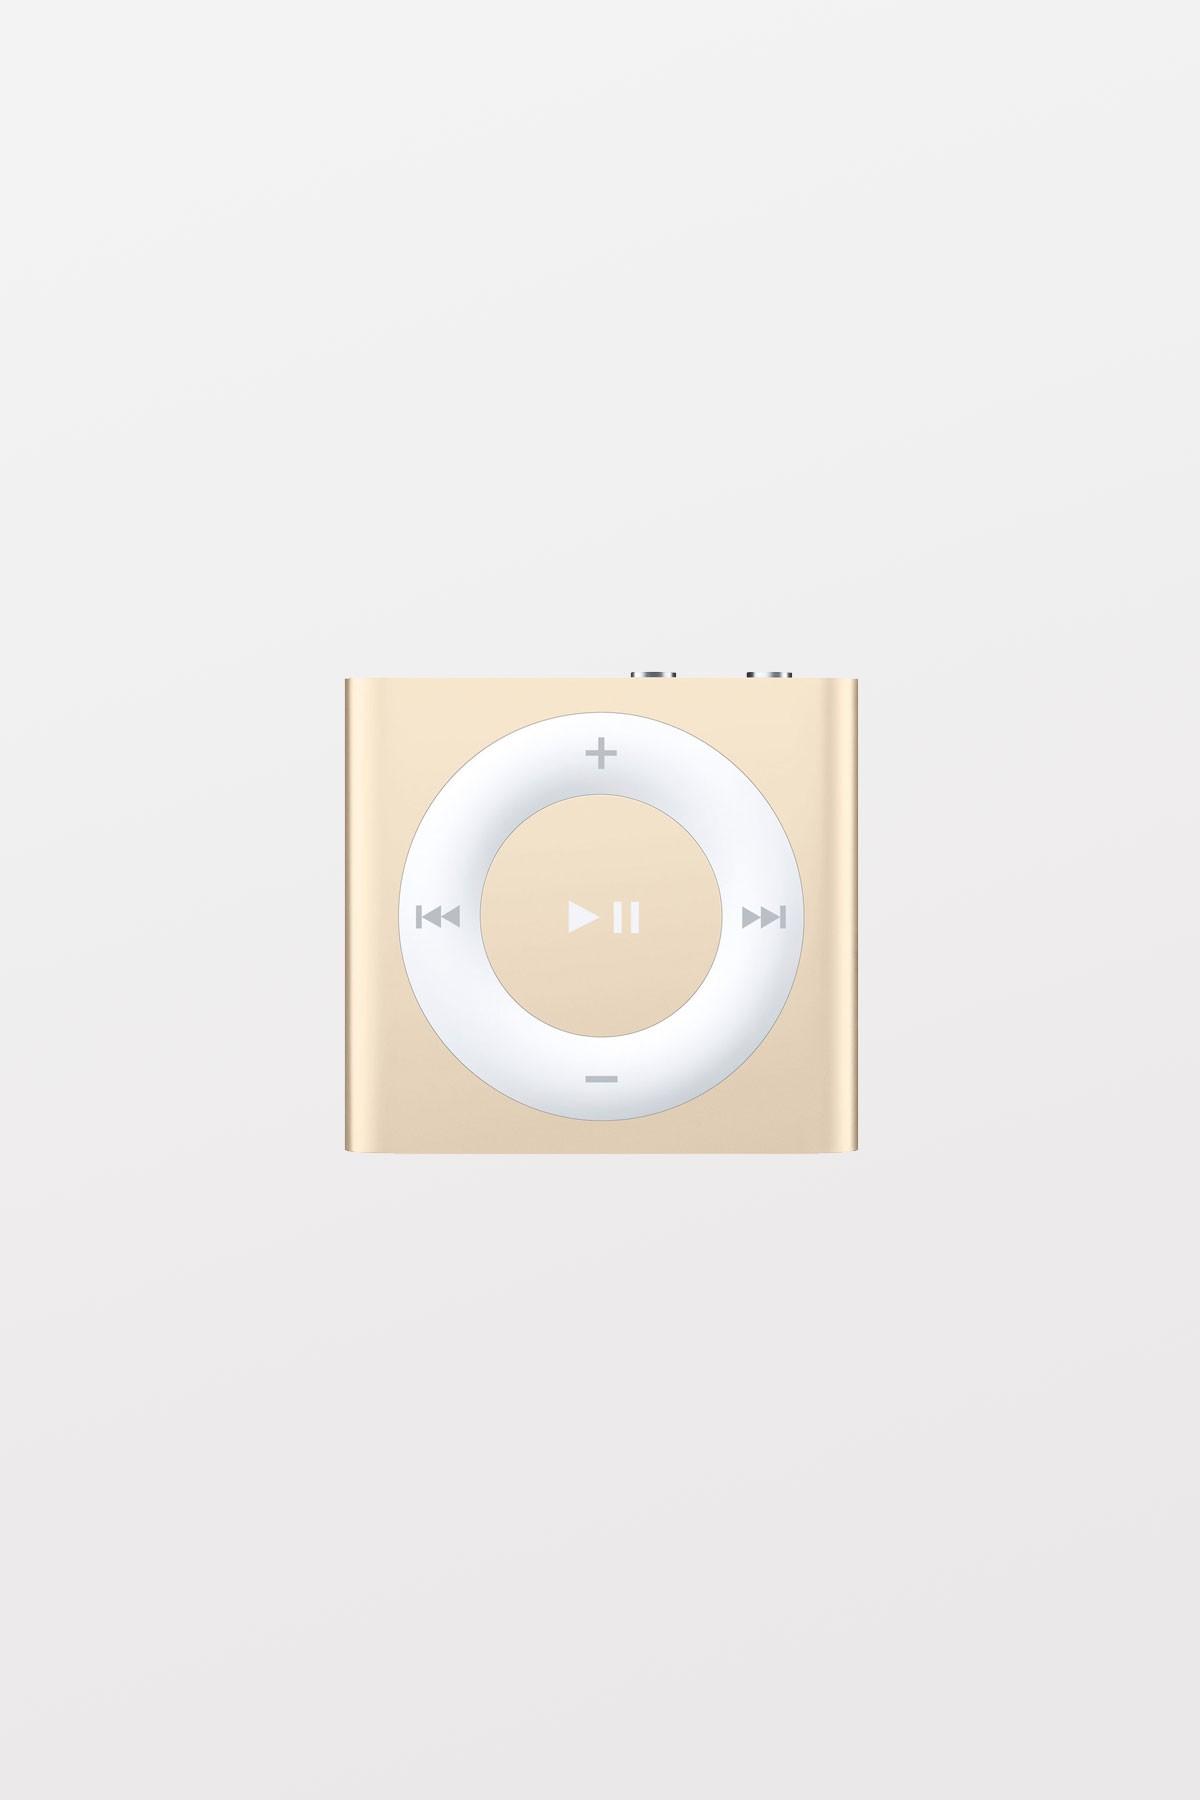 Apple iPod Shuffle 2GB - Gold - Refurbished